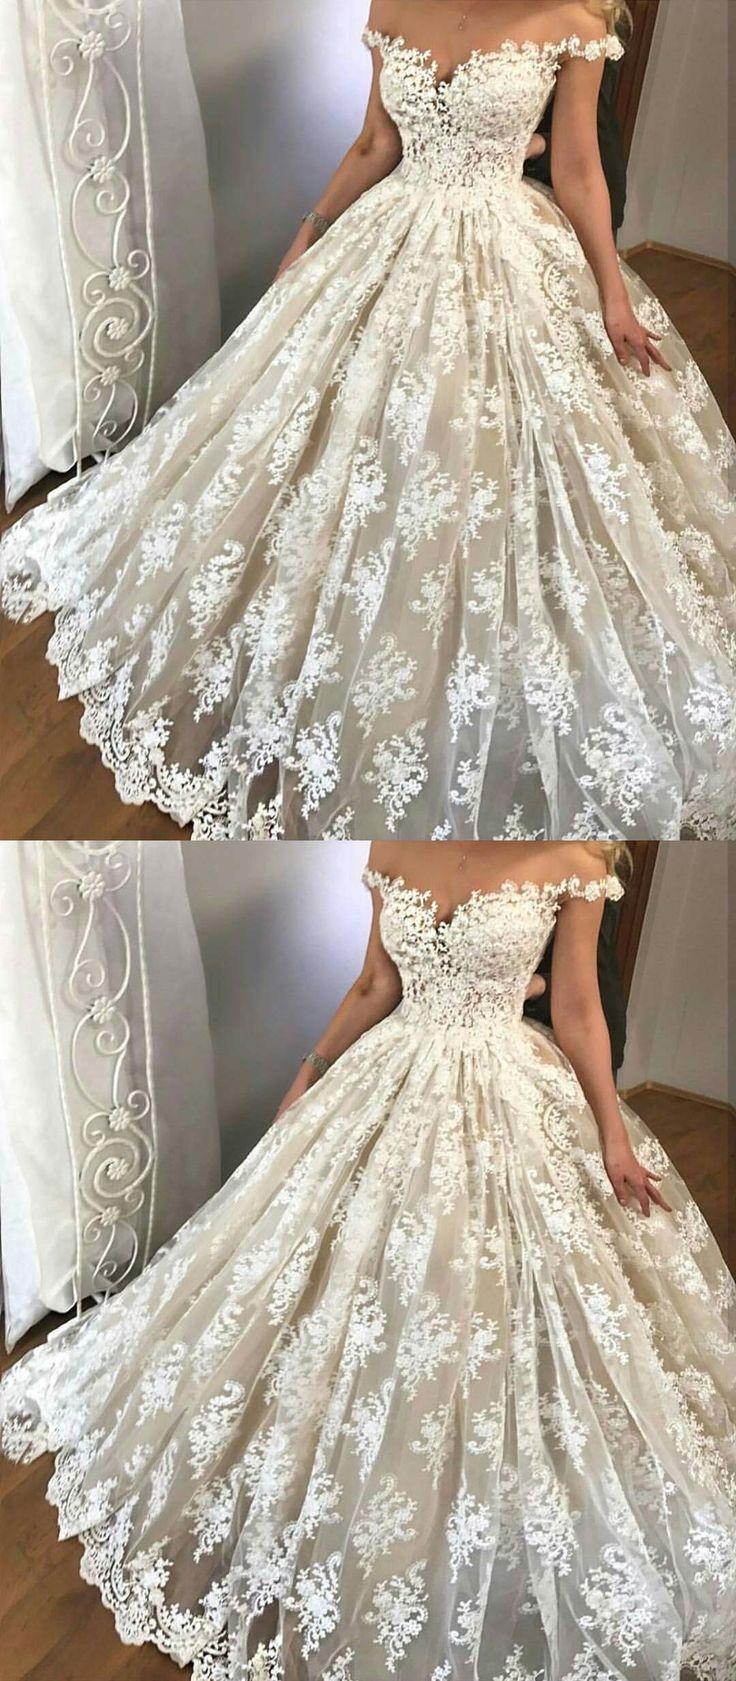 unique off the shoulder wedding dresses, glamorous wedding gowns with appliques, elegant light champagne lace bridal dresses